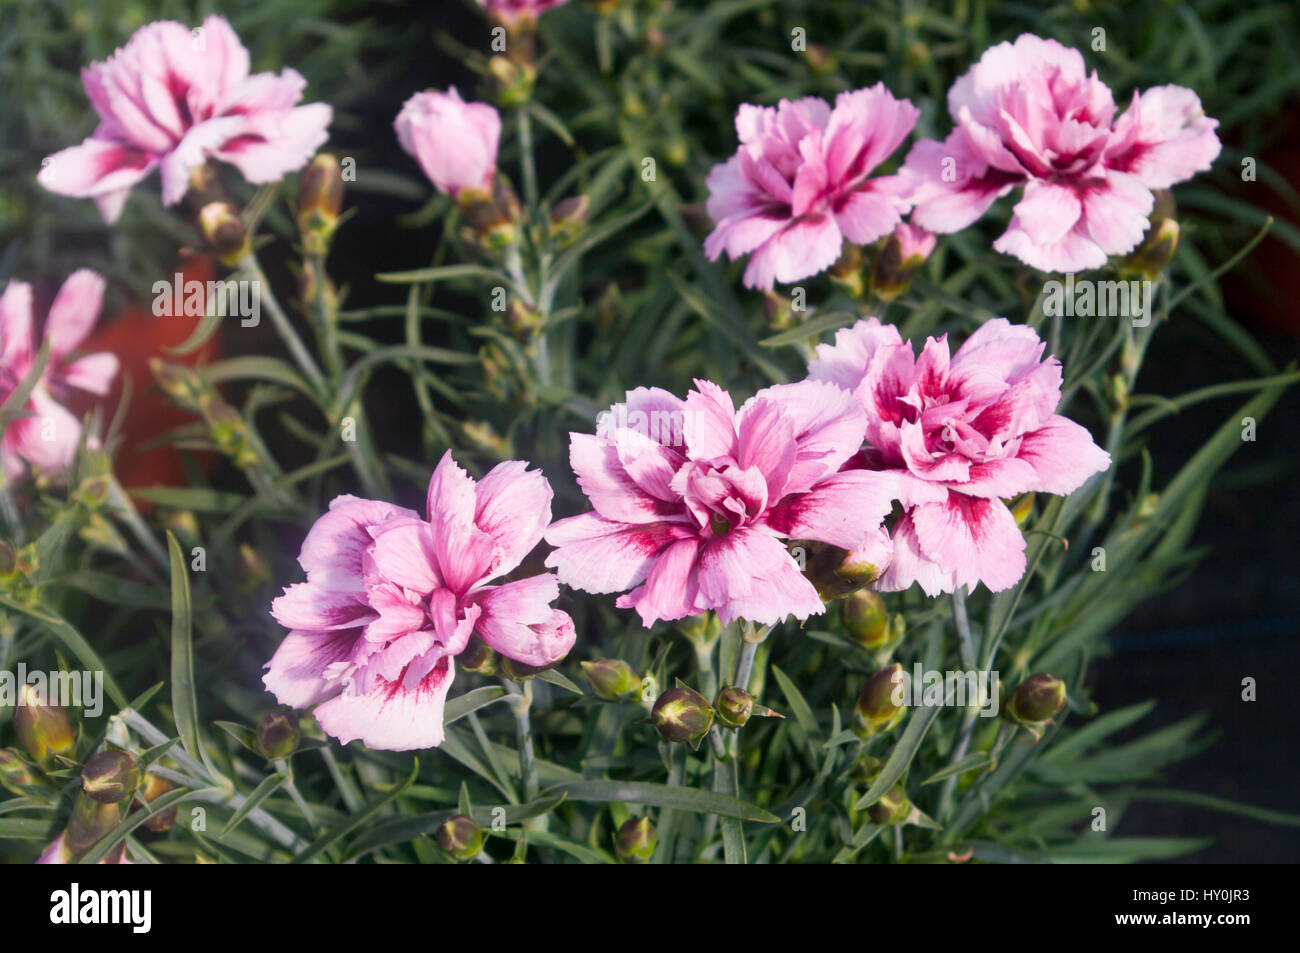 White flowers pinks dianthus stock photos white flowers pinks pink and white dianthus flowers otherwise known as pinks stock image mightylinksfo